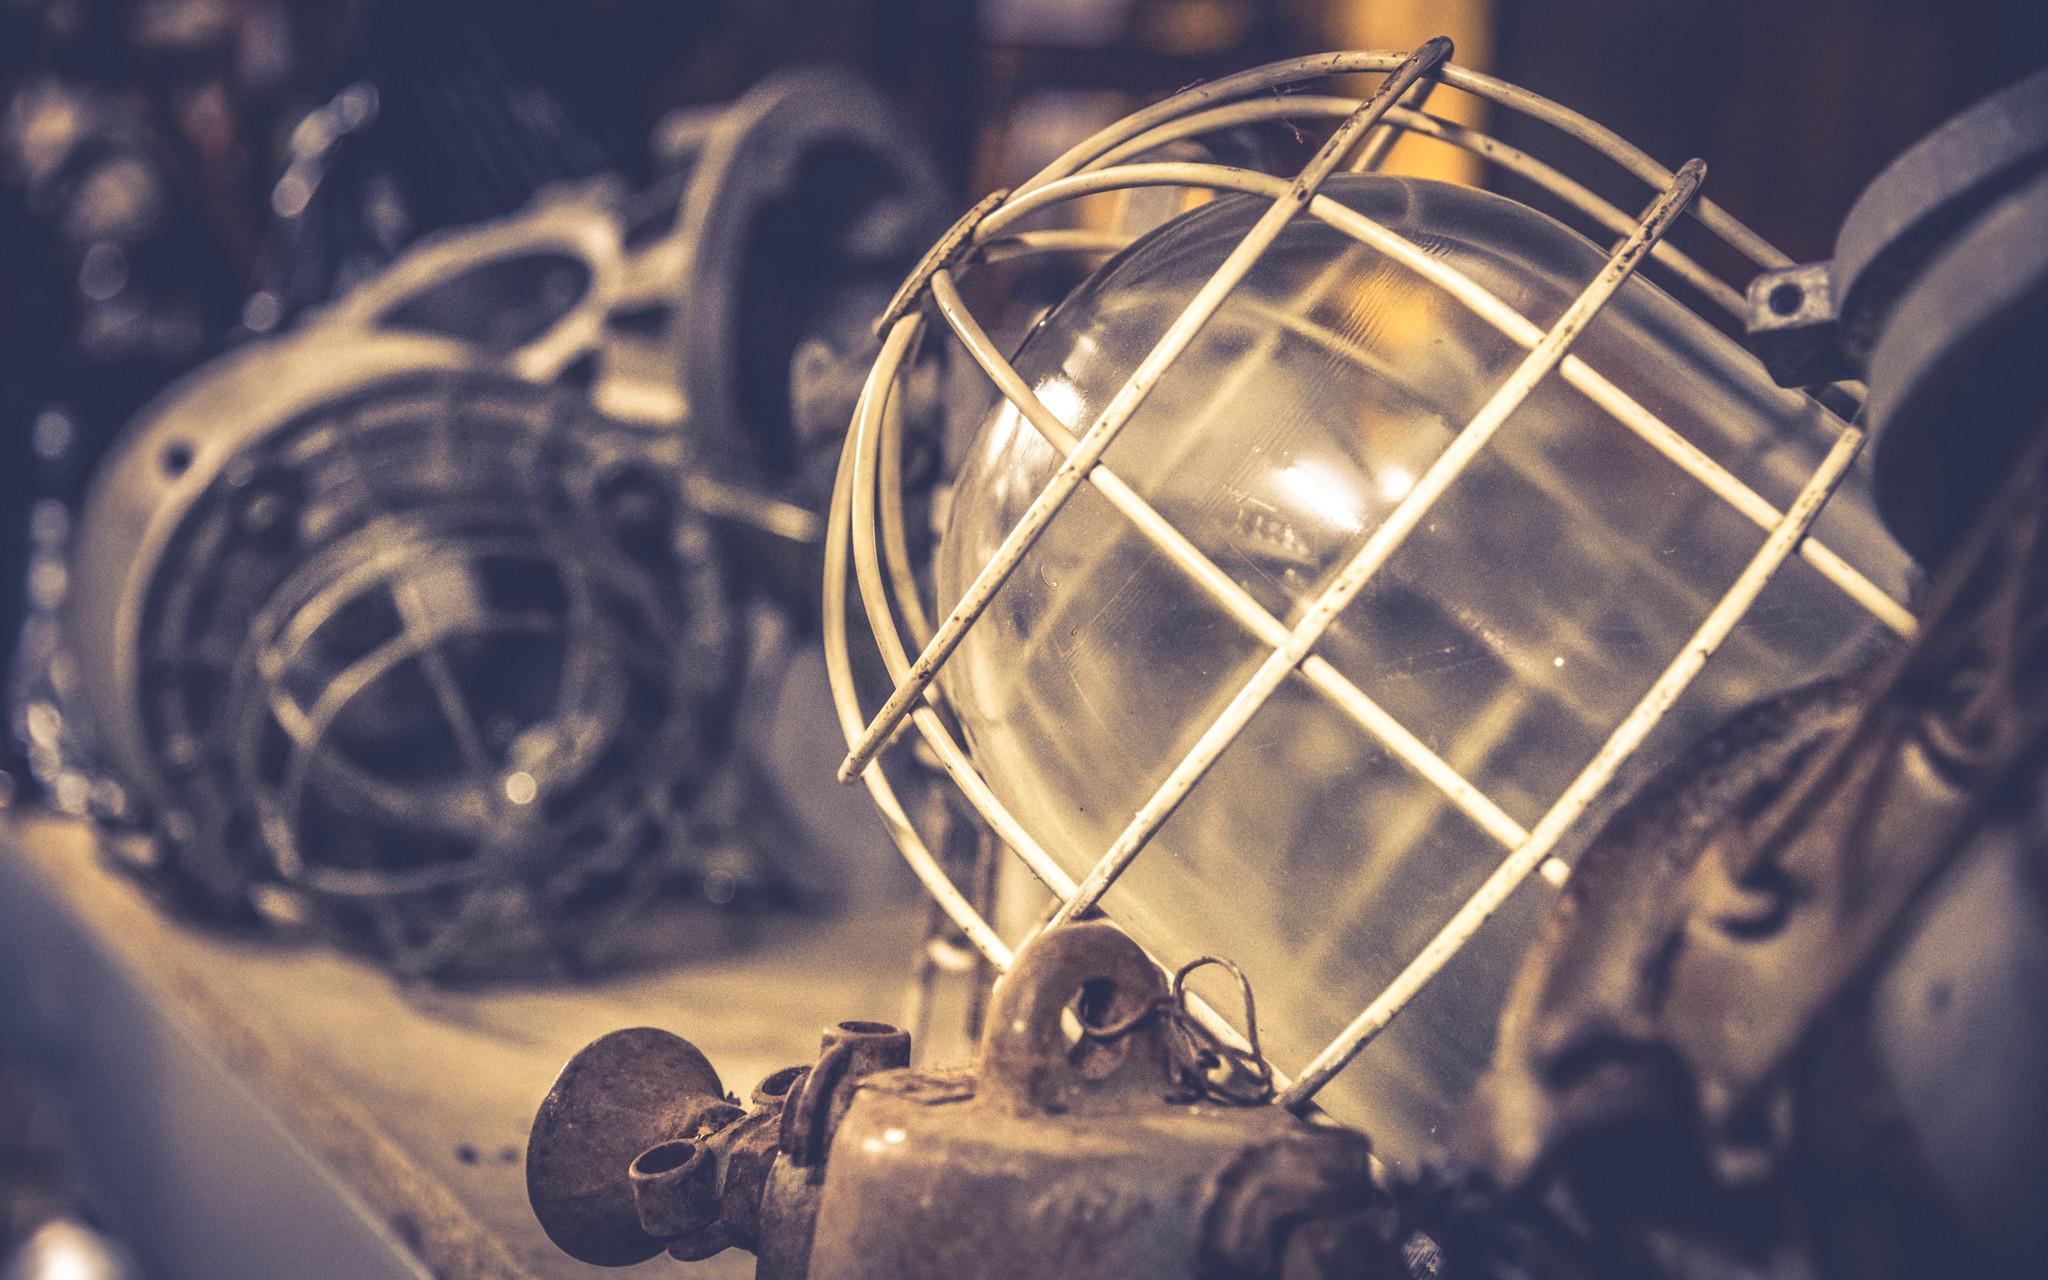 Industriële lampen ombouwen